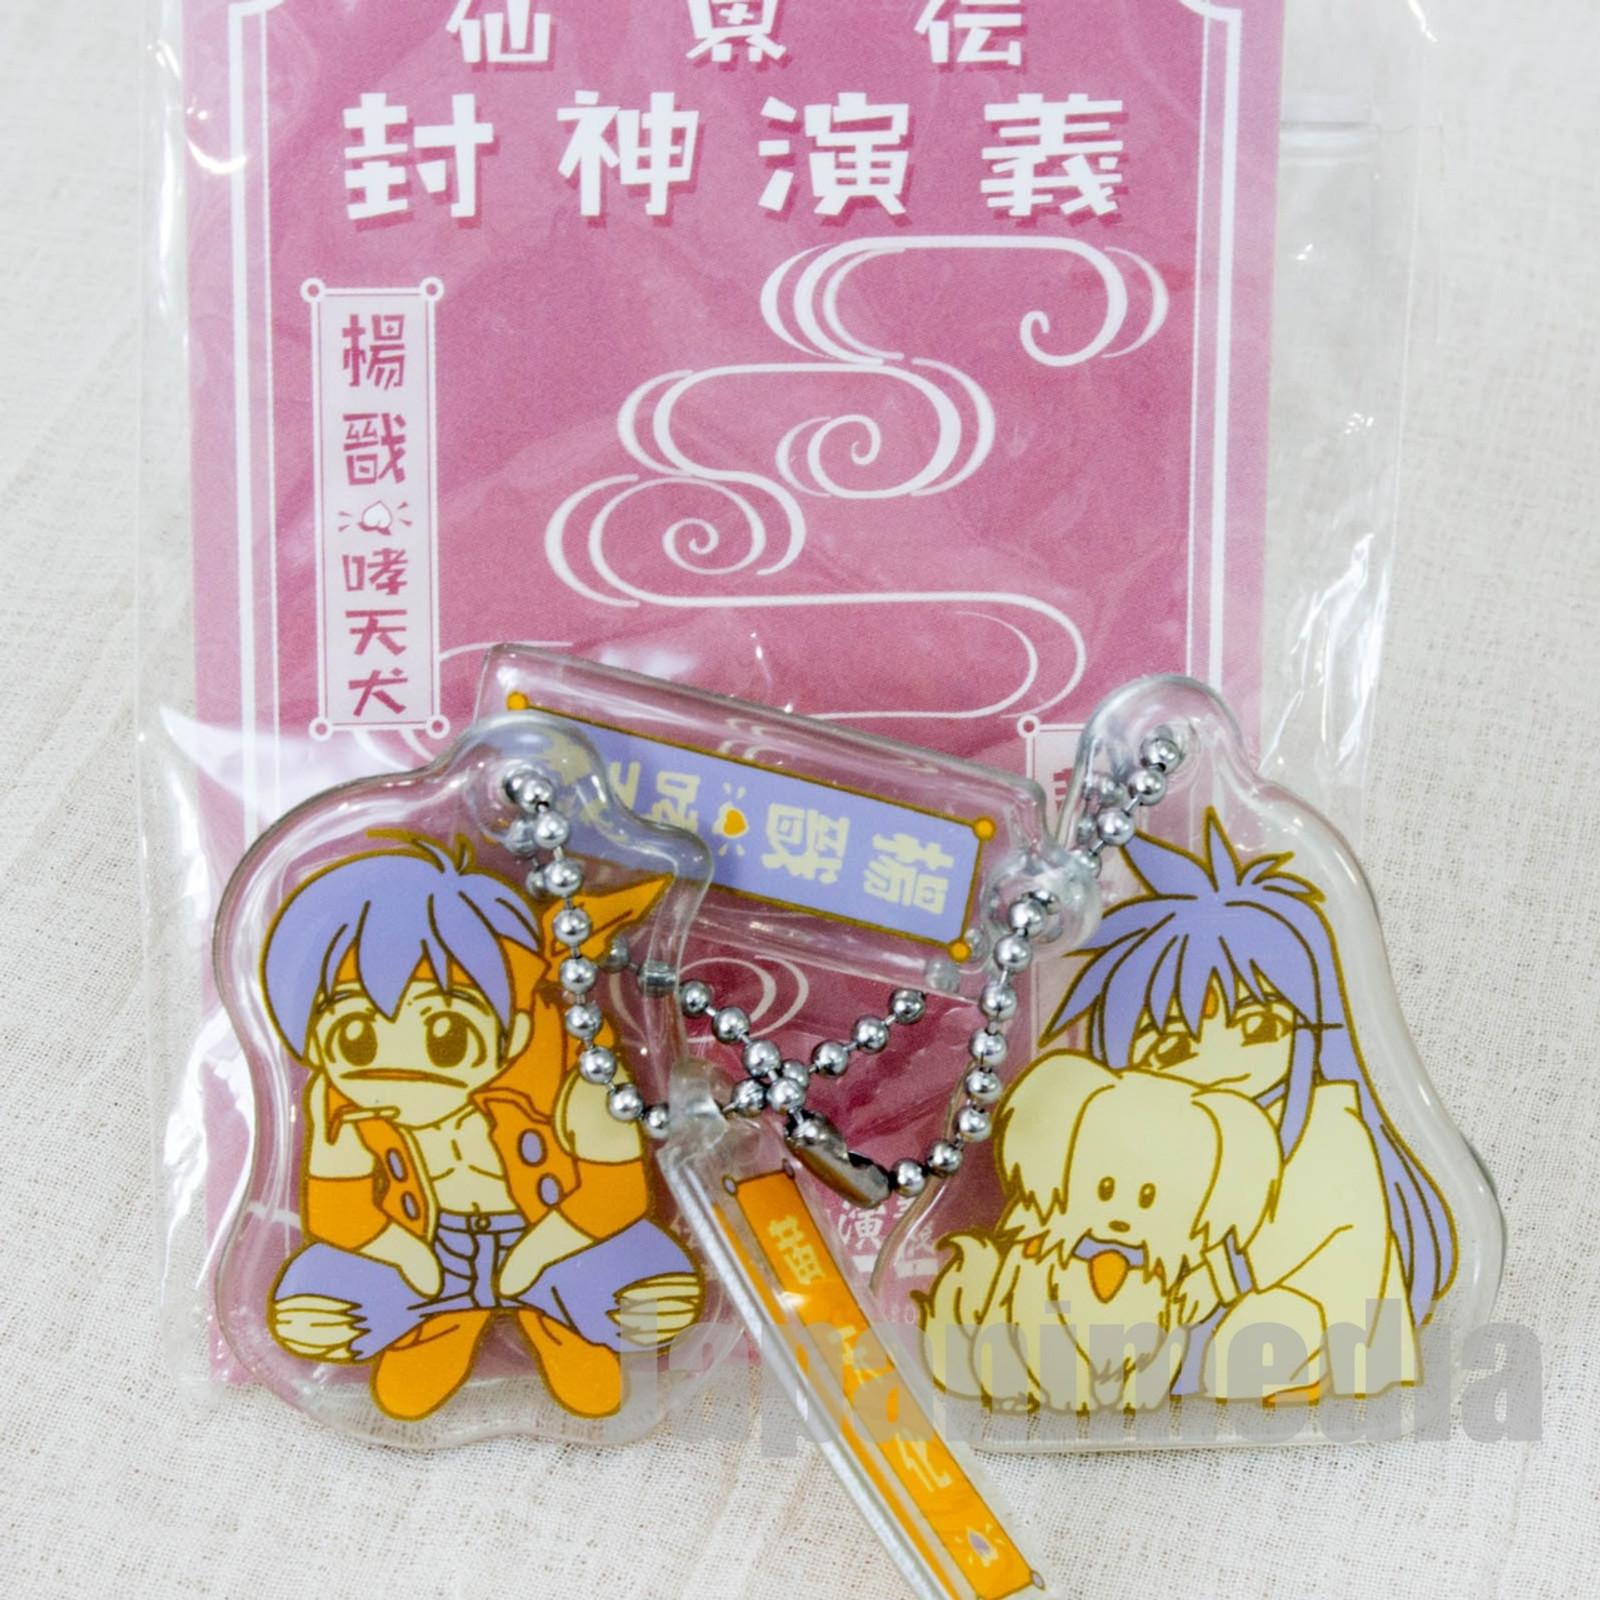 Senkaiden Hoshin Engi Youzen Koutenken Kou Tenka Rubber Mascot Ballchain JAPAN